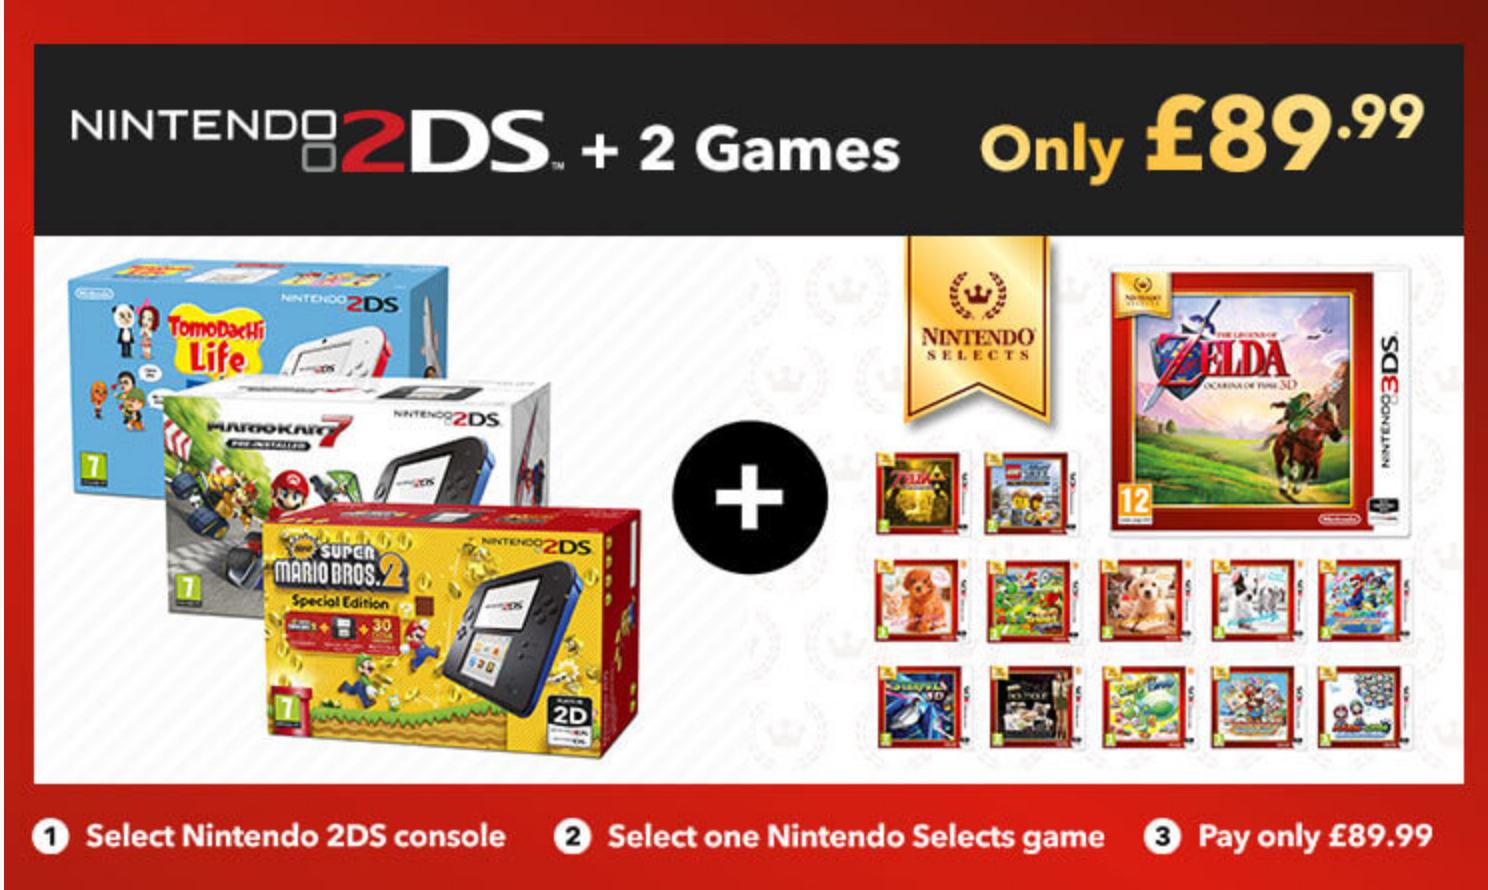 Nintendo 2DS + 2 Games @ Nintendo Store - £89.99